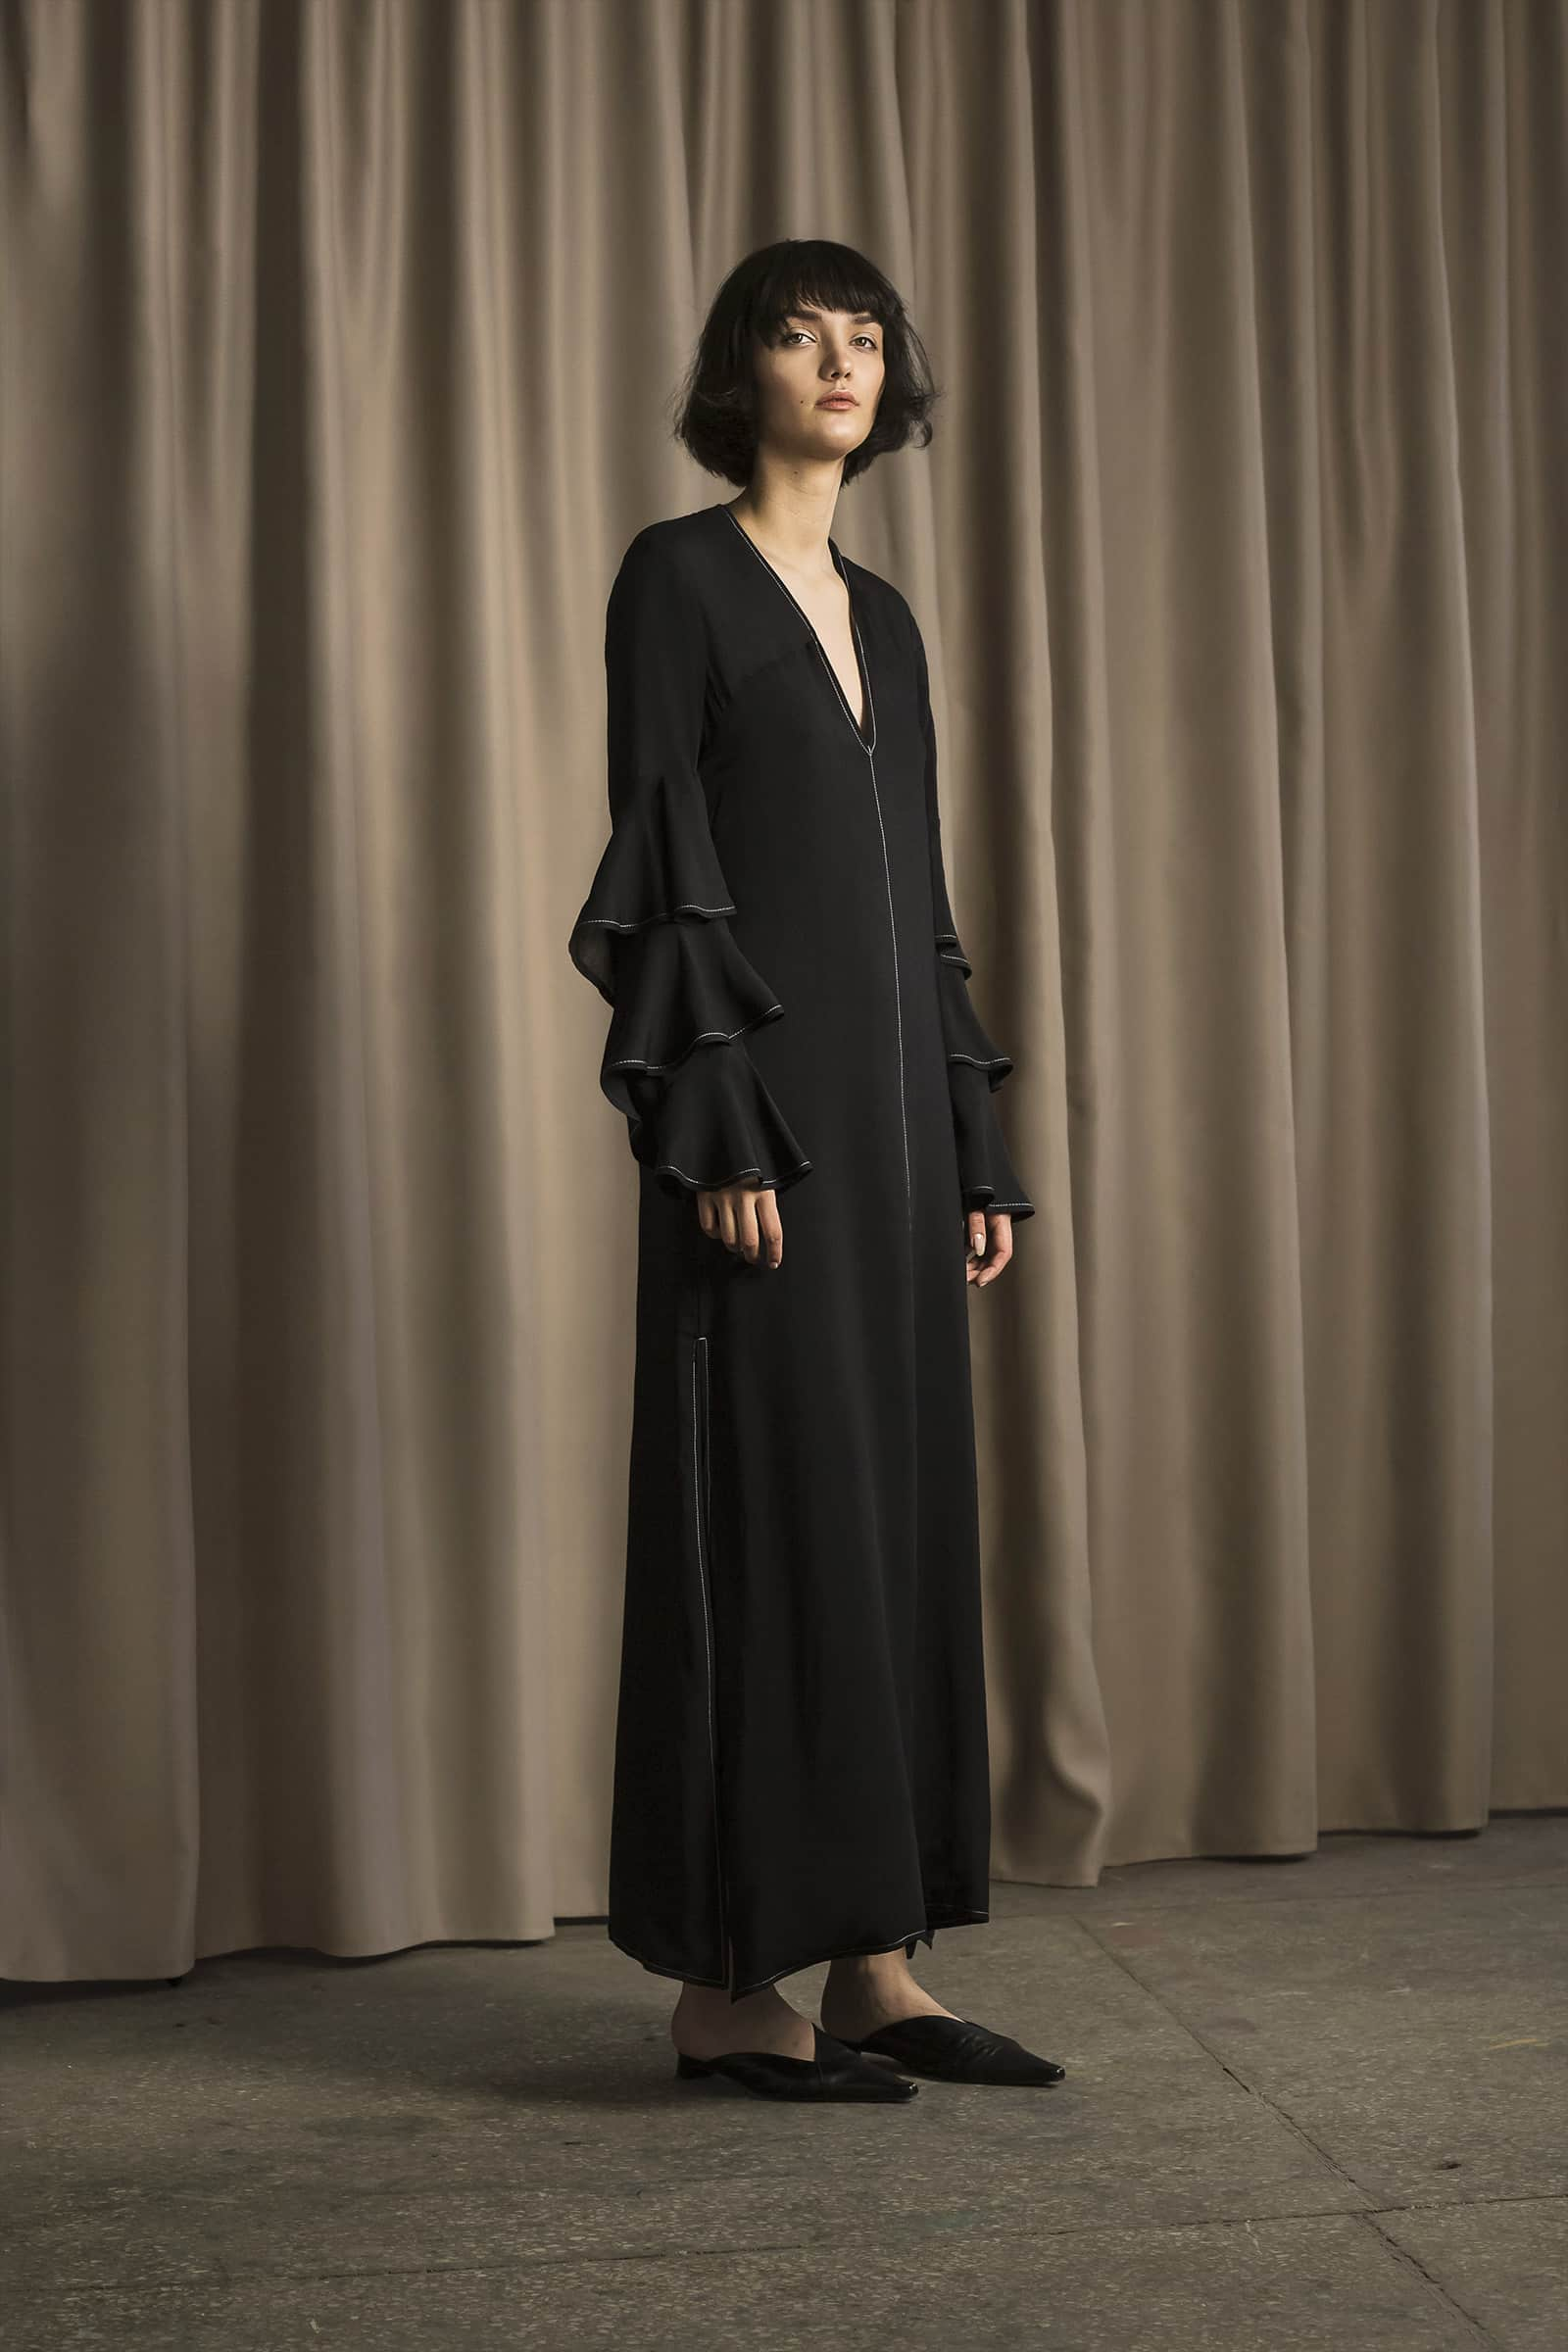 sukienka-maxi-z-falbanami_cyvonyuk_lookbook_C_02